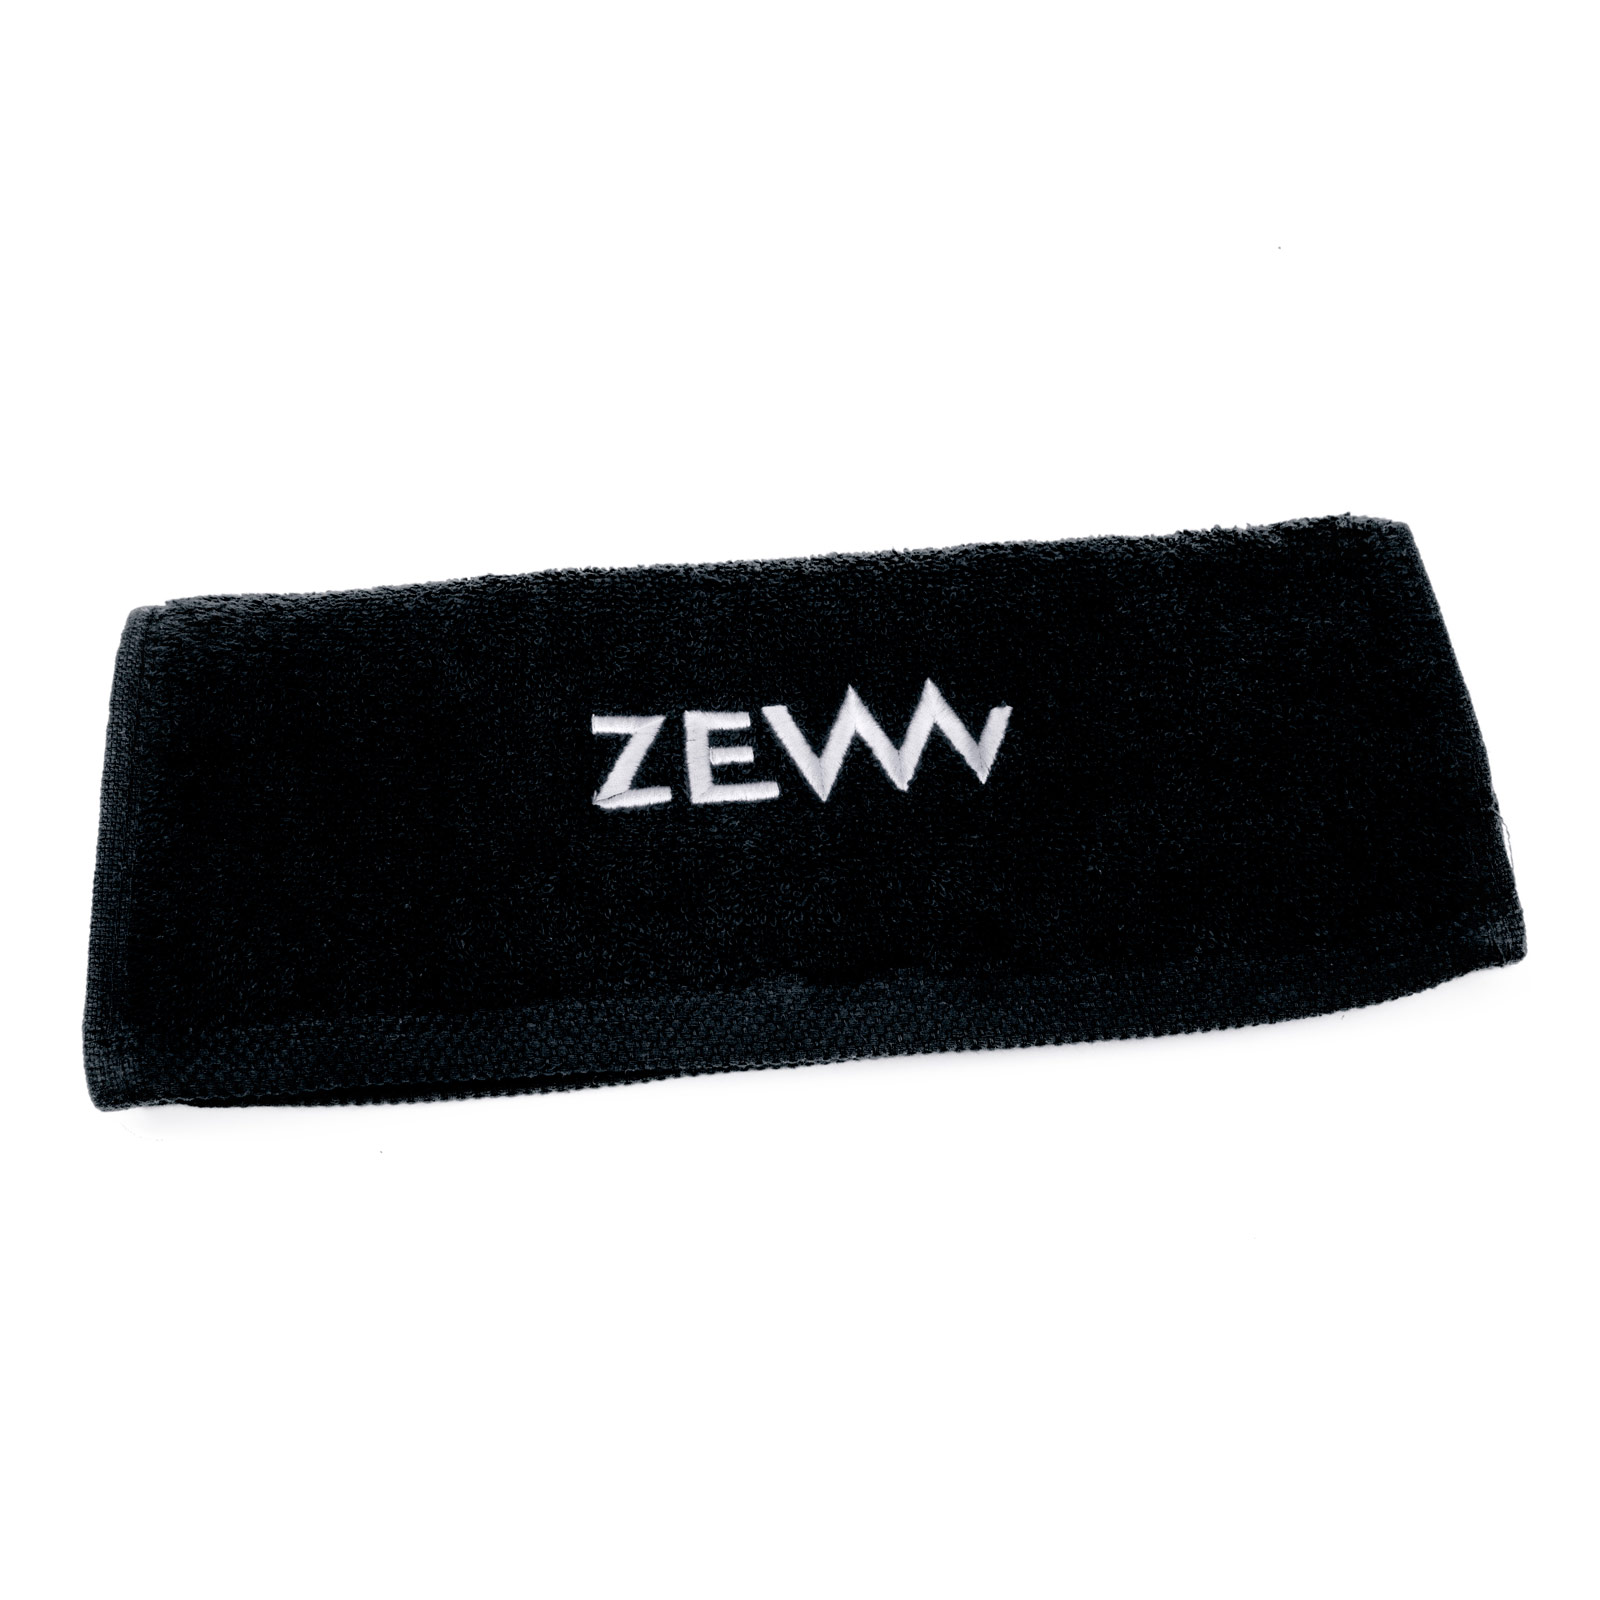 Captain Fawcett Luxurious Hand Towel - ręcznik do rąk  (1)